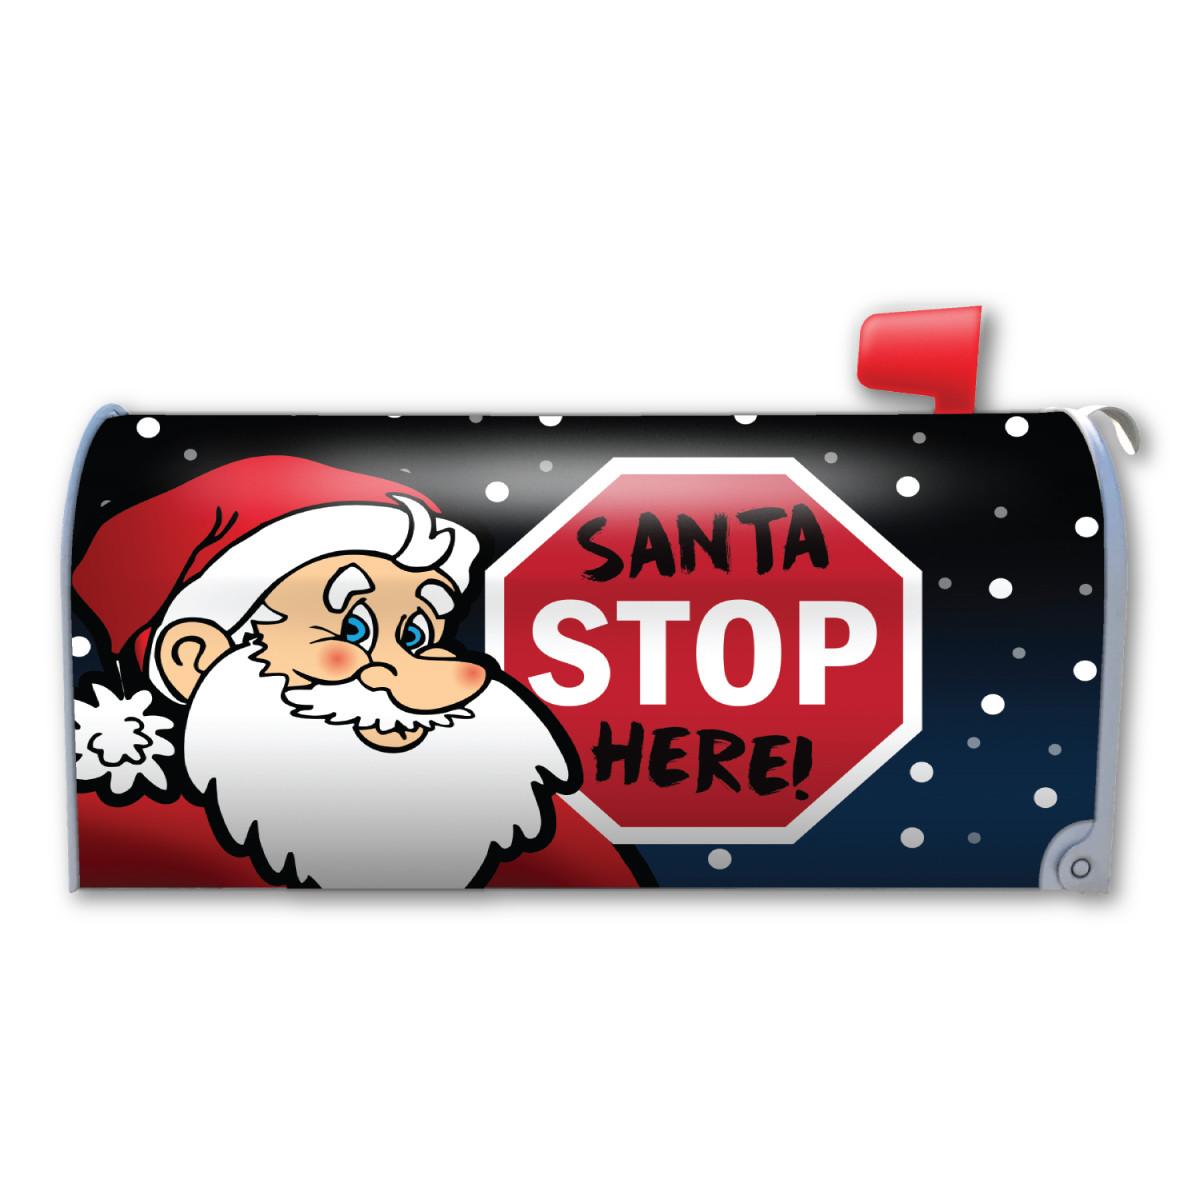 Santa Stop Here Mailbox Cover Magnet Magnet America